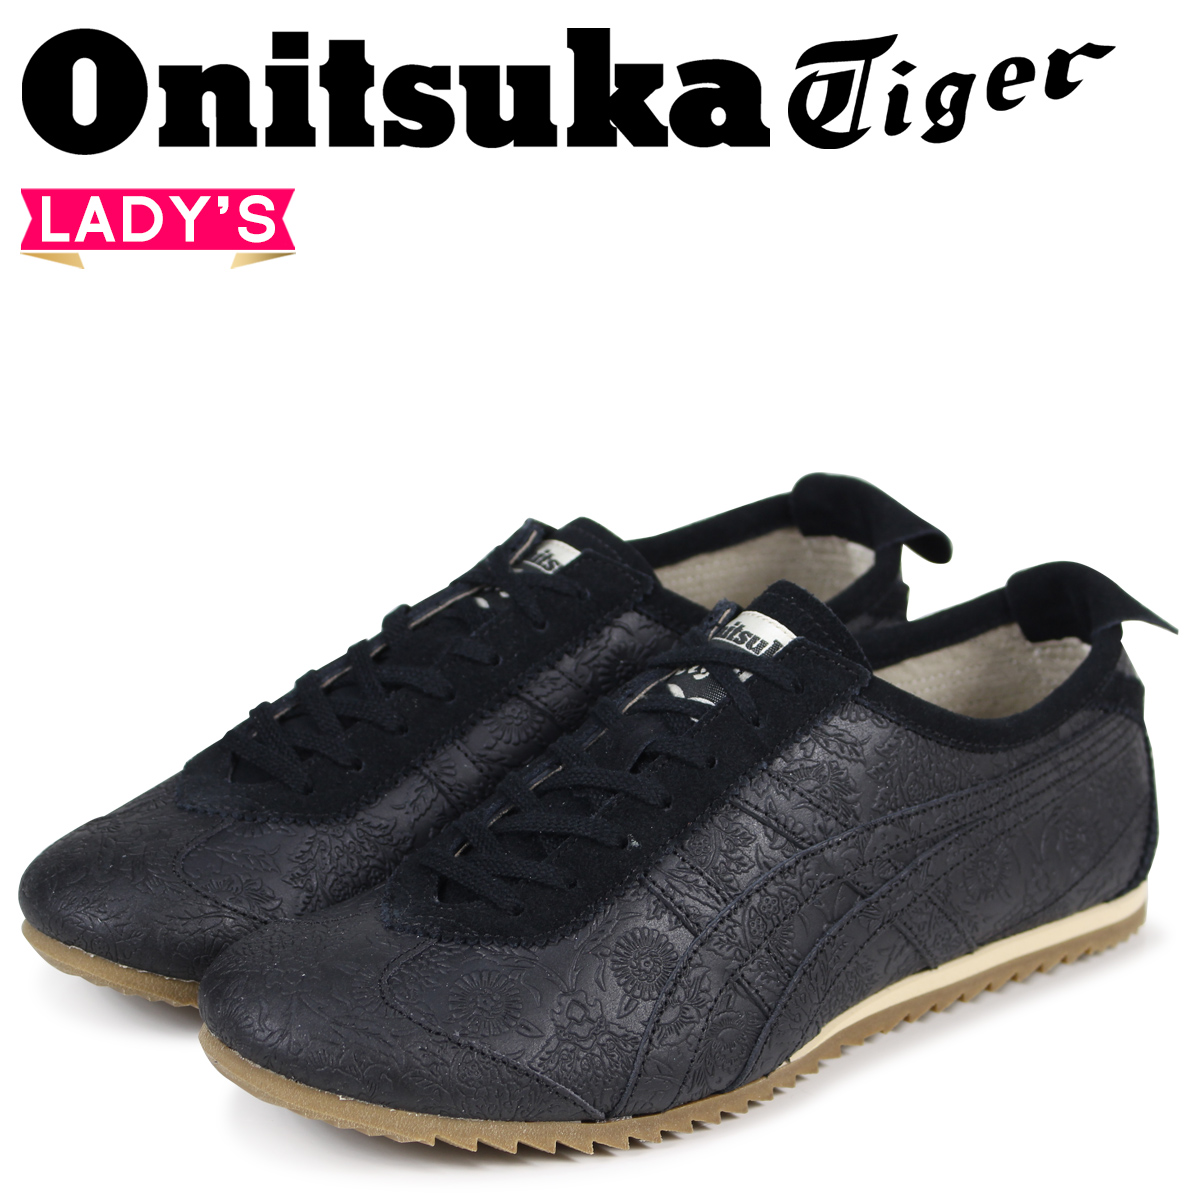 Onitsuka Tiger リンバー UD プレステージ オニツカタイガー LIMBER PRESTIGE レディース スニーカー D8B9L-9090 ブラック